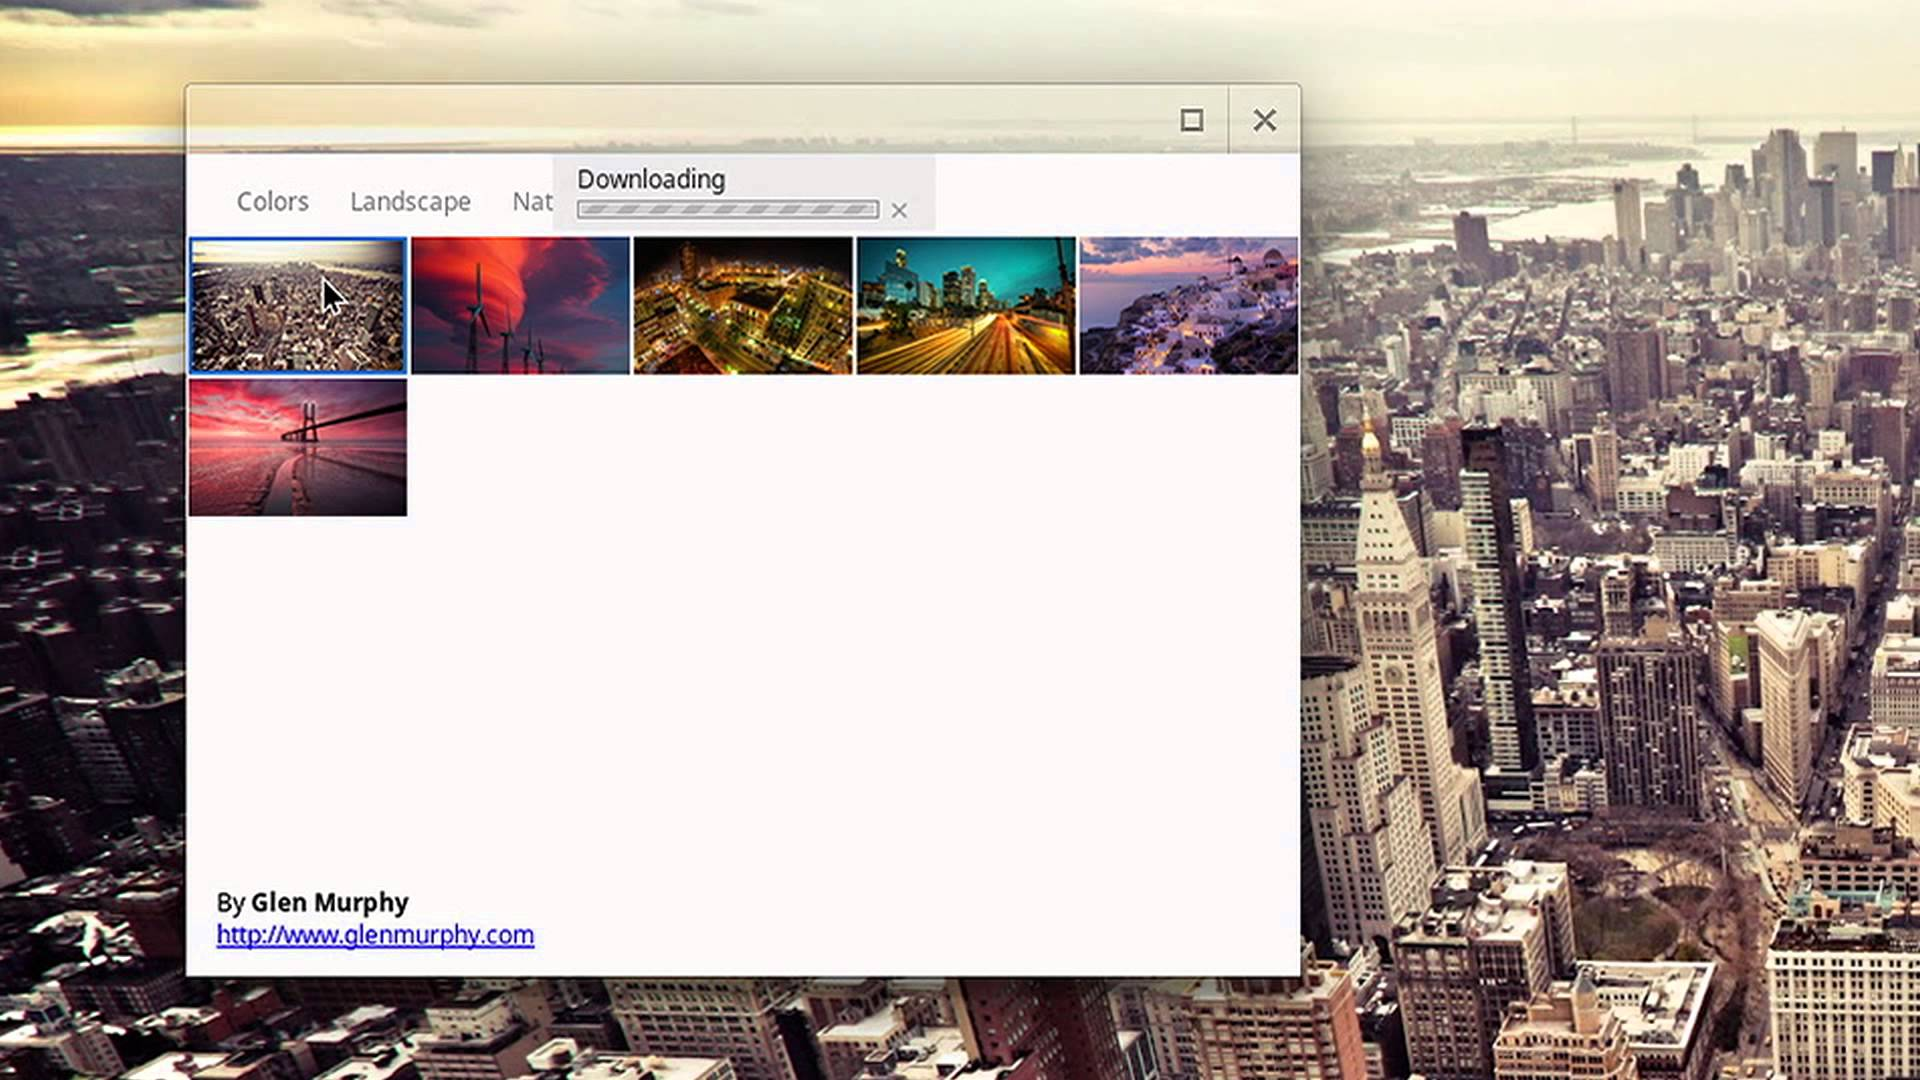 [49+] Change Wallpaper on Chromebook on WallpaperSafari